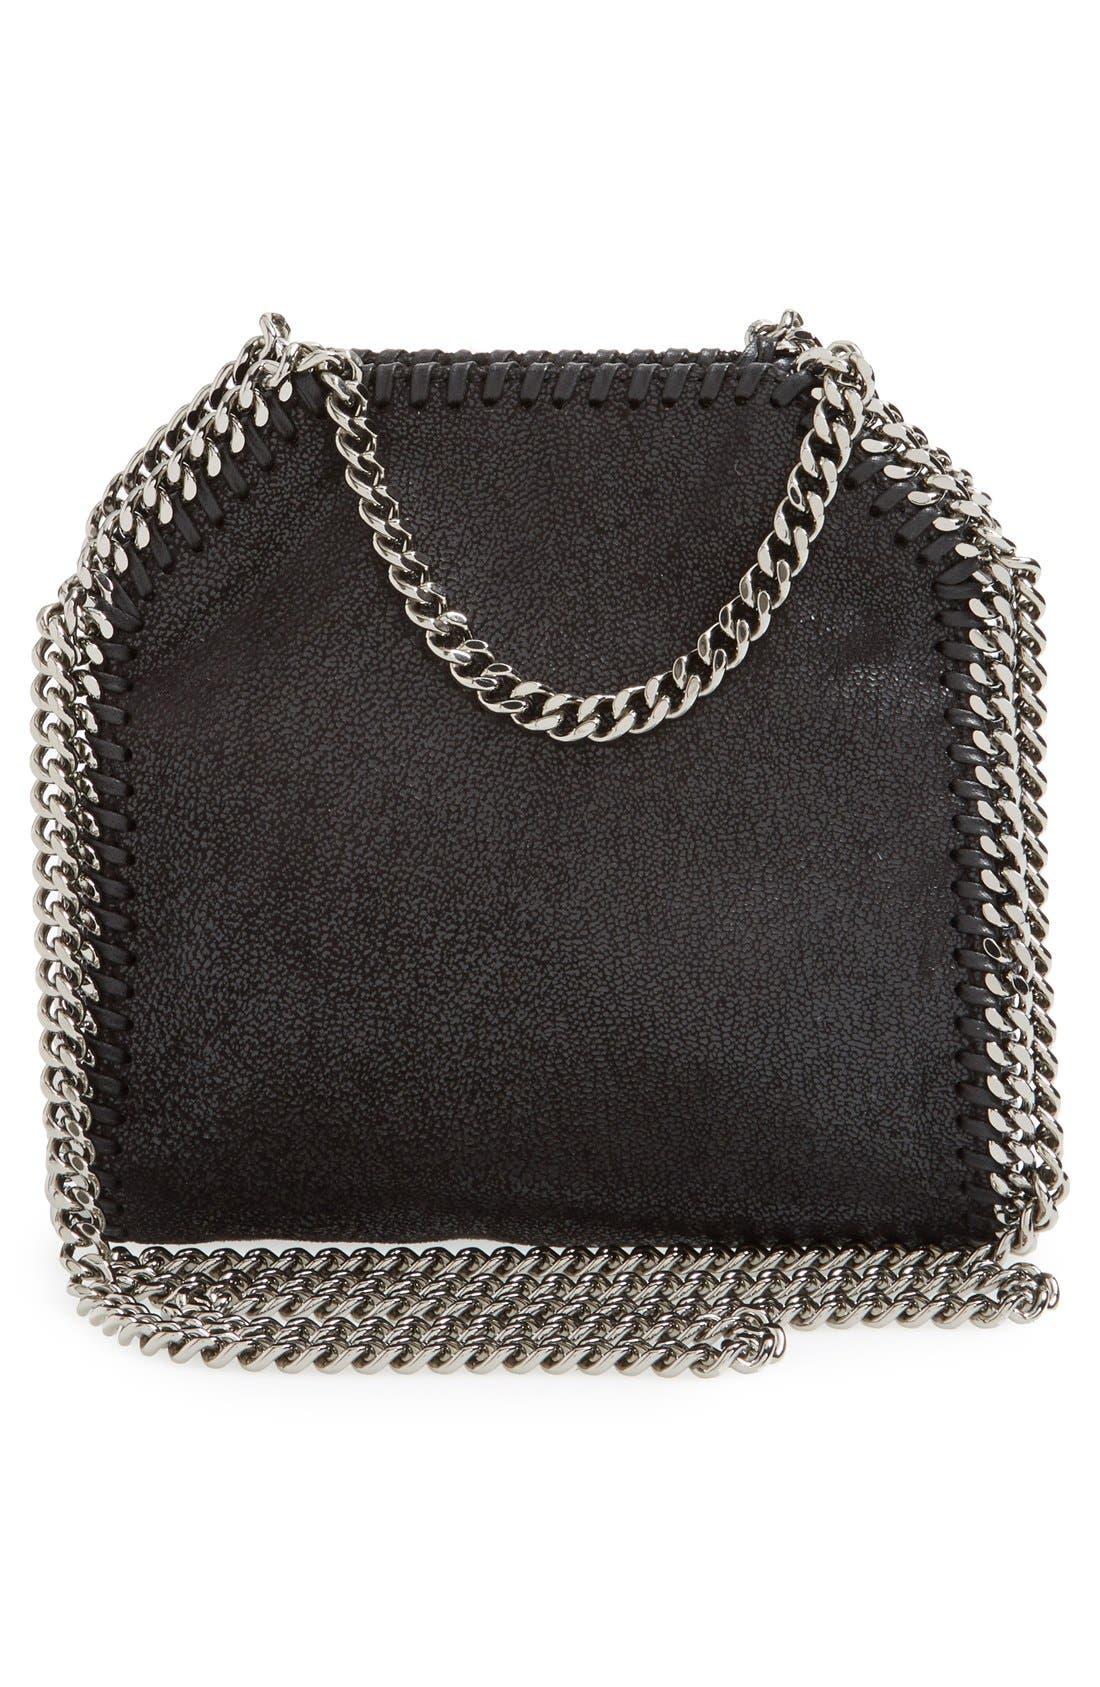 'Tiny Falabella' Faux Leather Crossbody Bag,                             Alternate thumbnail 3, color,                             Black